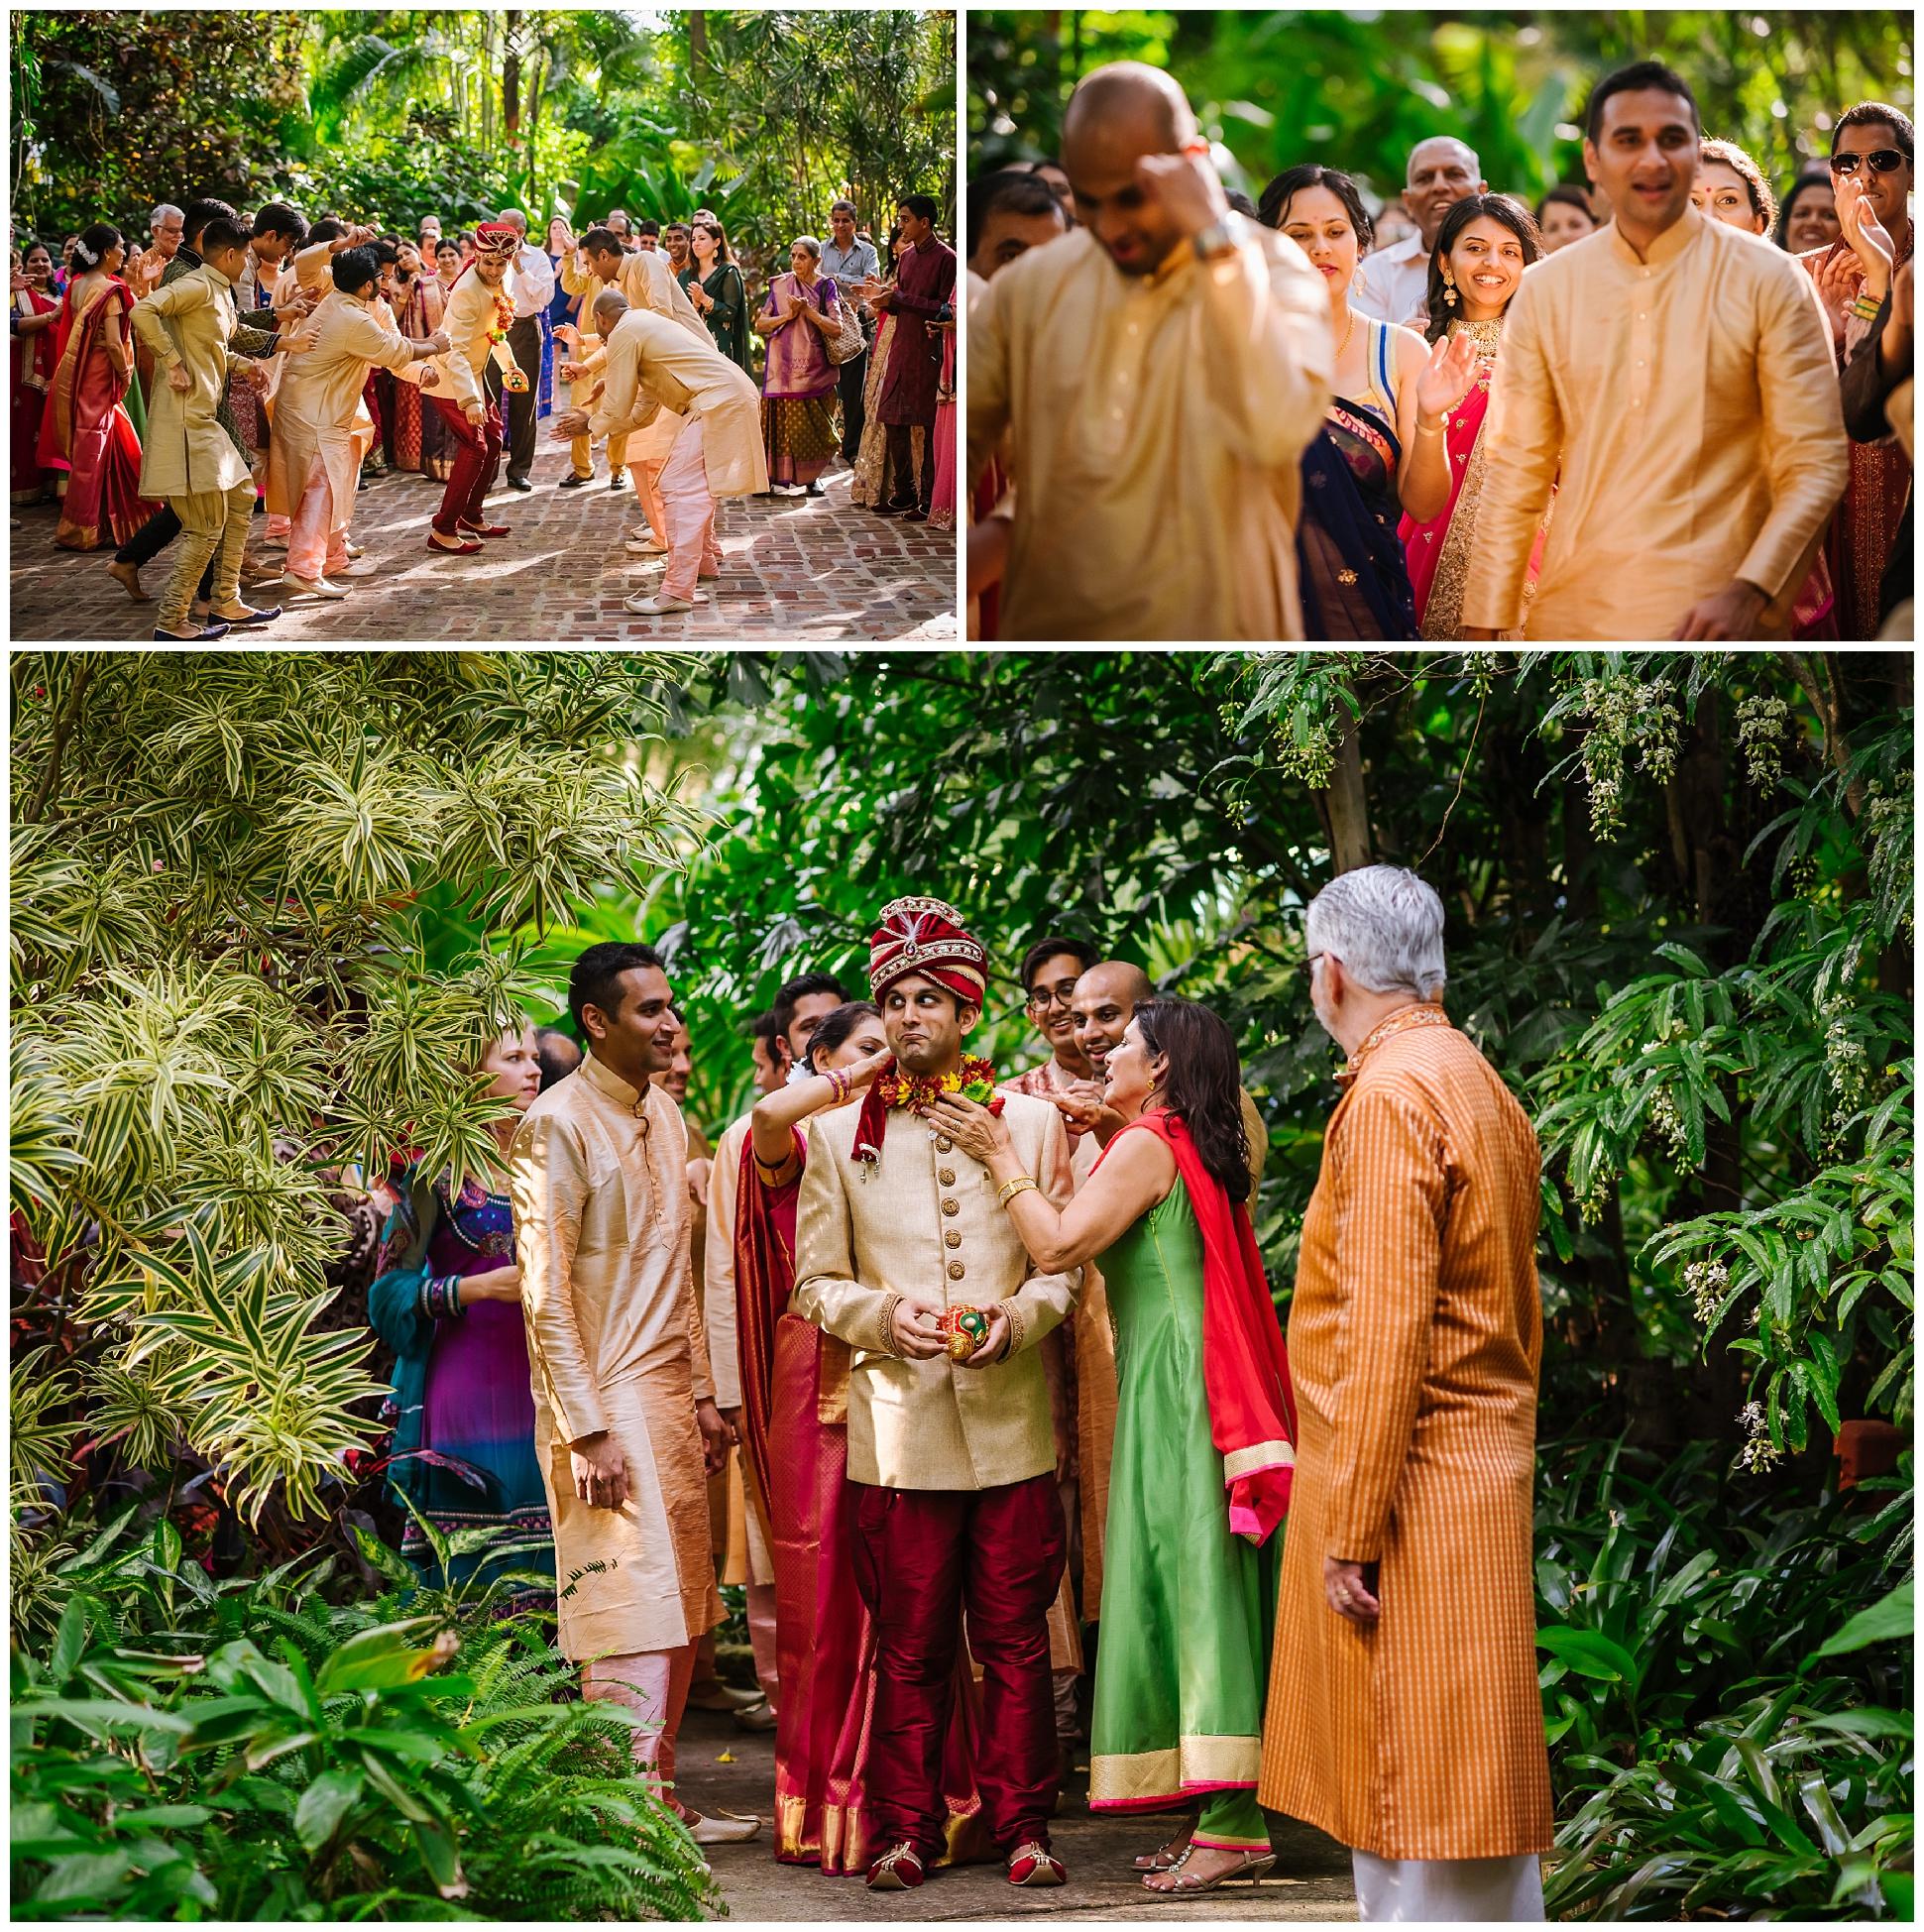 St-pete-indian-wedding-photographer-barat-sunken-gardens_0095.jpg